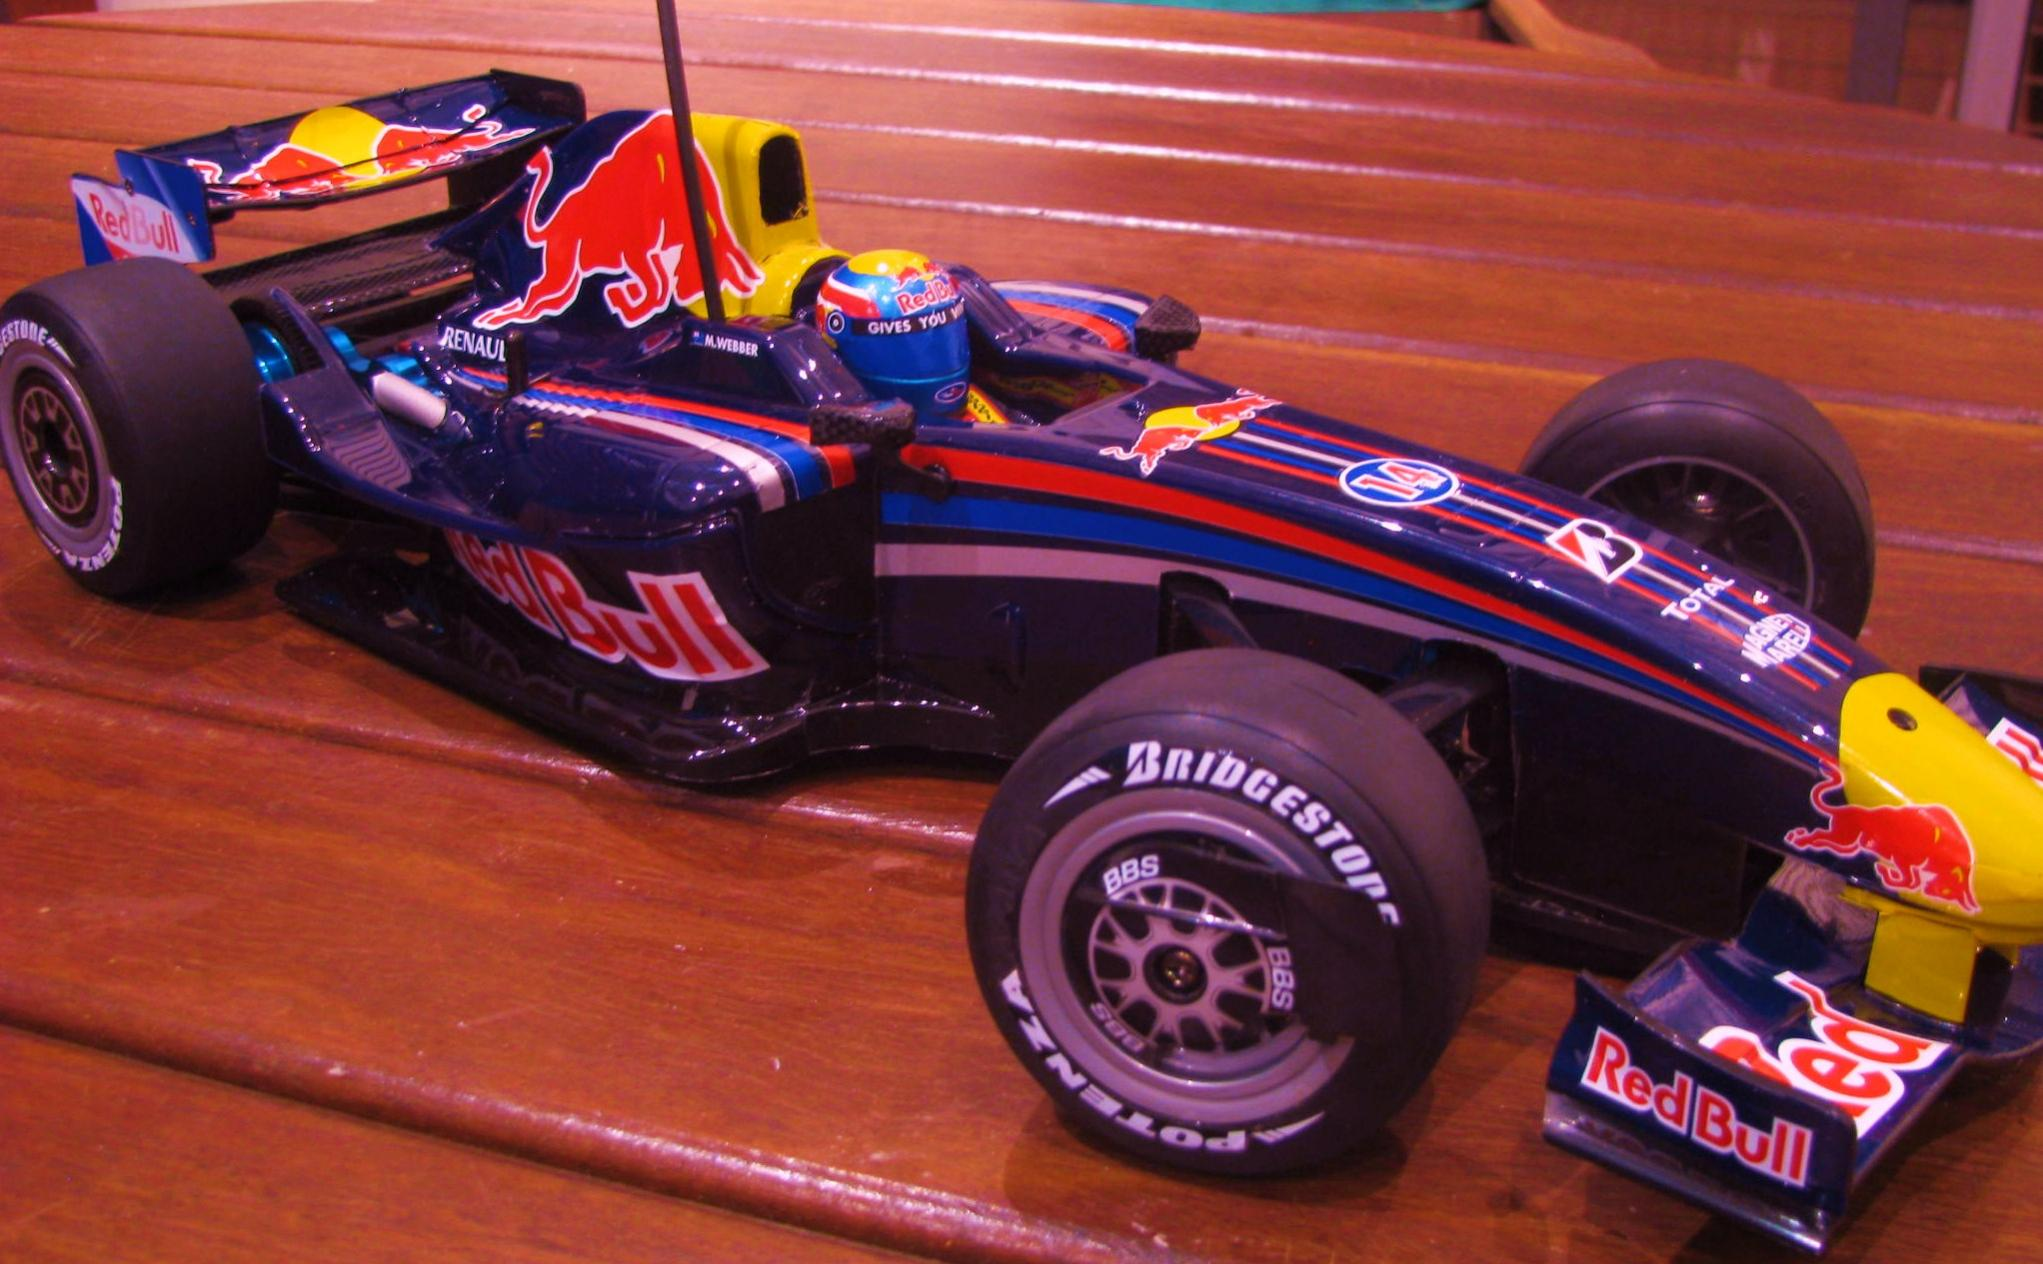 Tamiya F104 Setup Tamiya F104 Pro!-red-bull.jpg